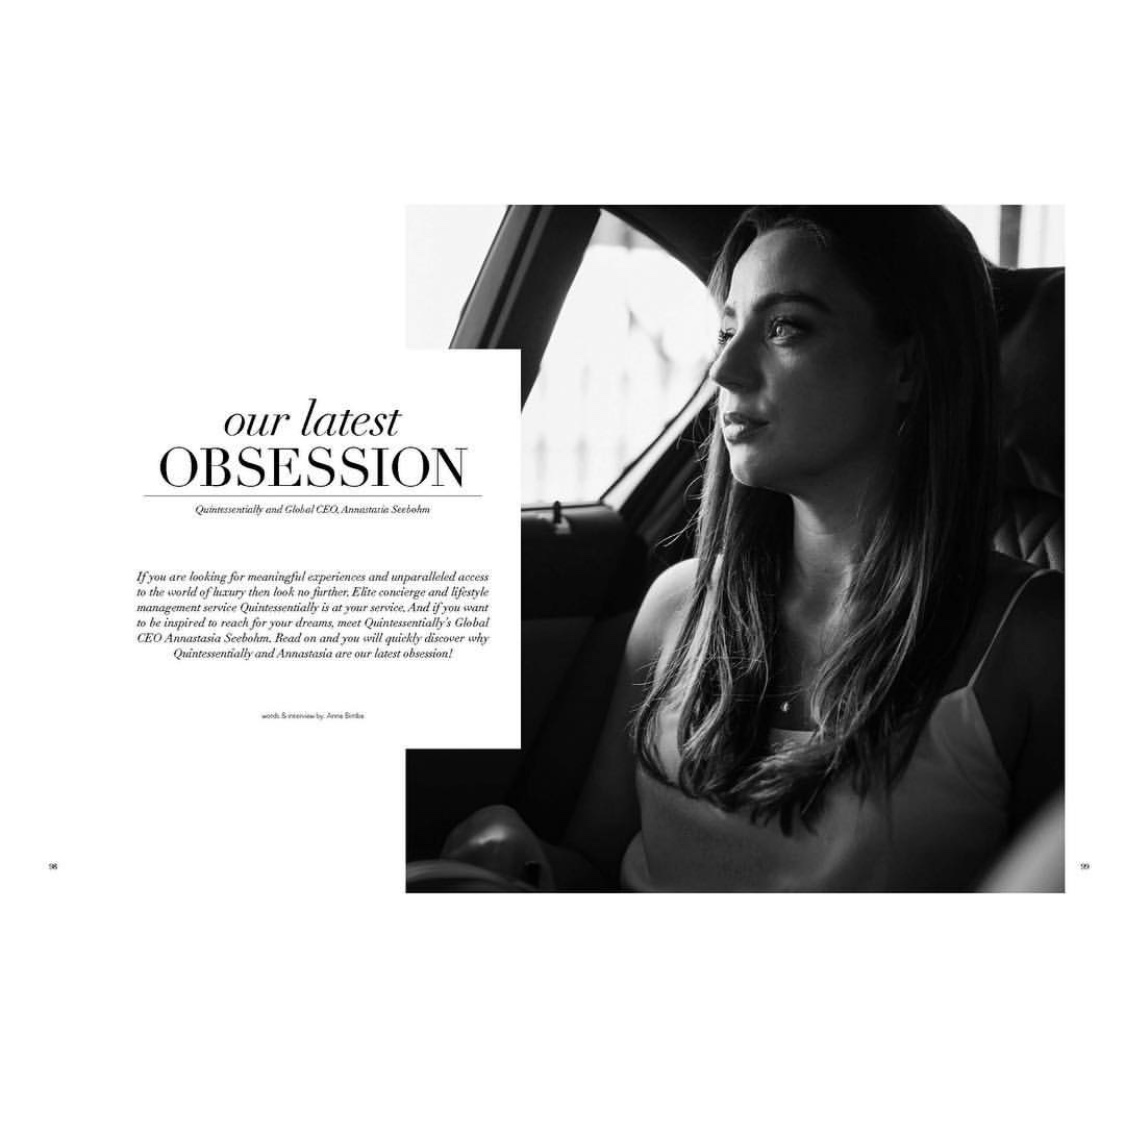 Annastasia Seebohm Electric Woman Brand Ambassador in Love Happens magazine